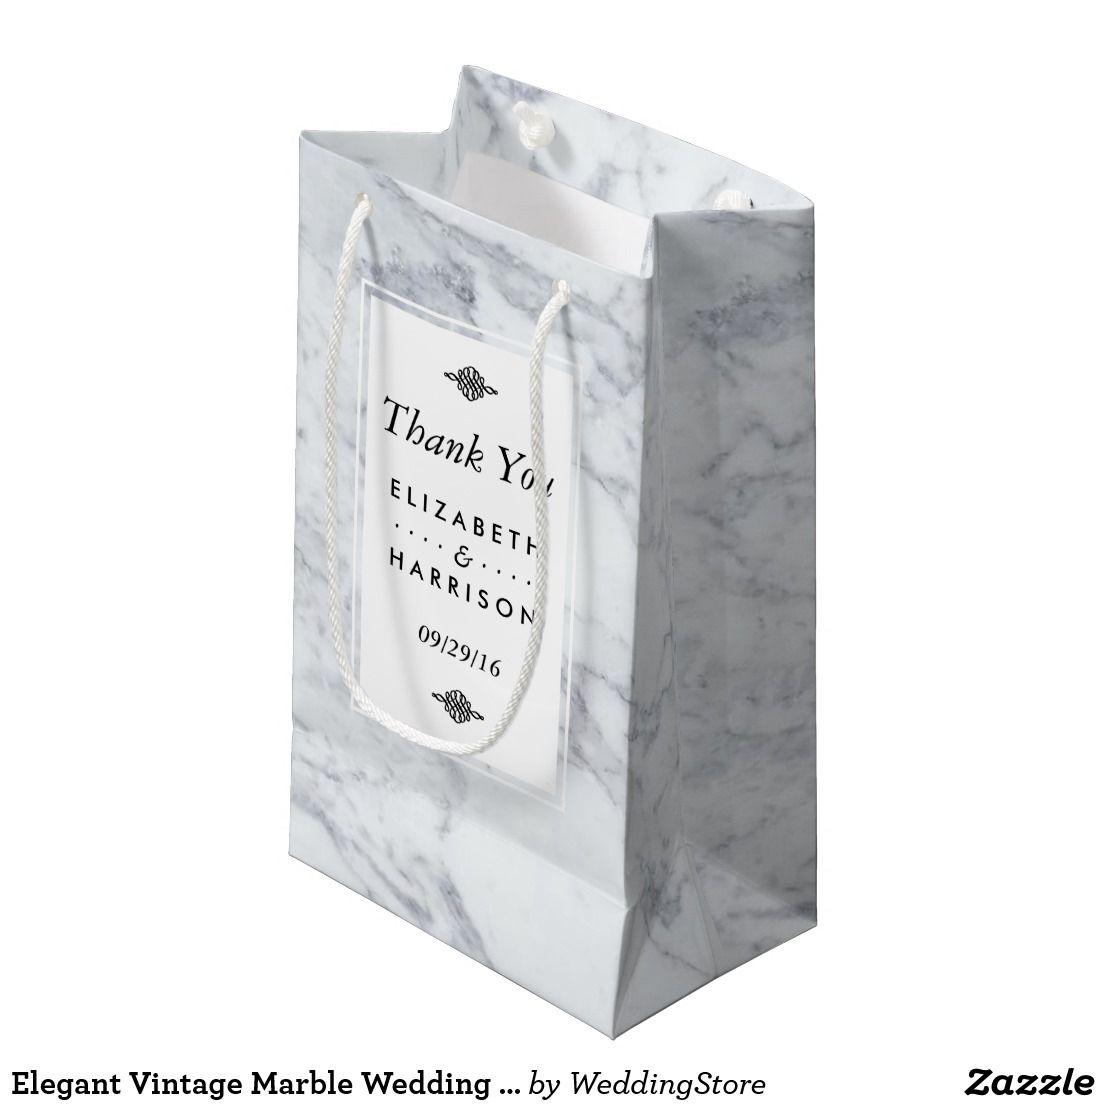 Elegant Vintage Marble Wedding Favor Small Gift Bag | Small gift ...